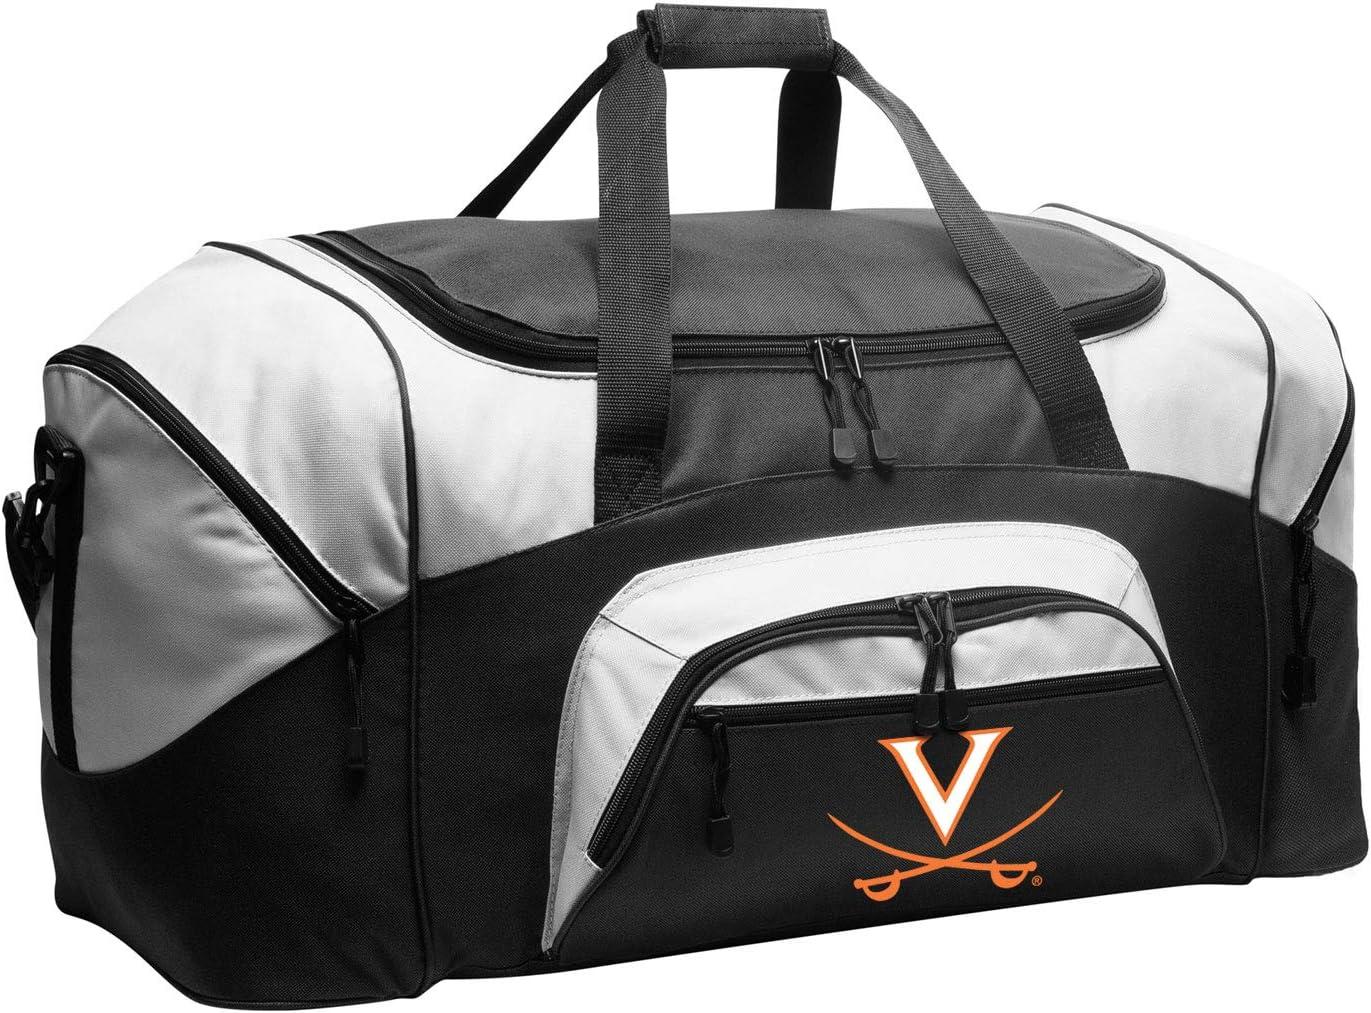 LARGE Las Vegas Mall UVA Duffel Bag University of Very popular or Suitcase Gym Virginia